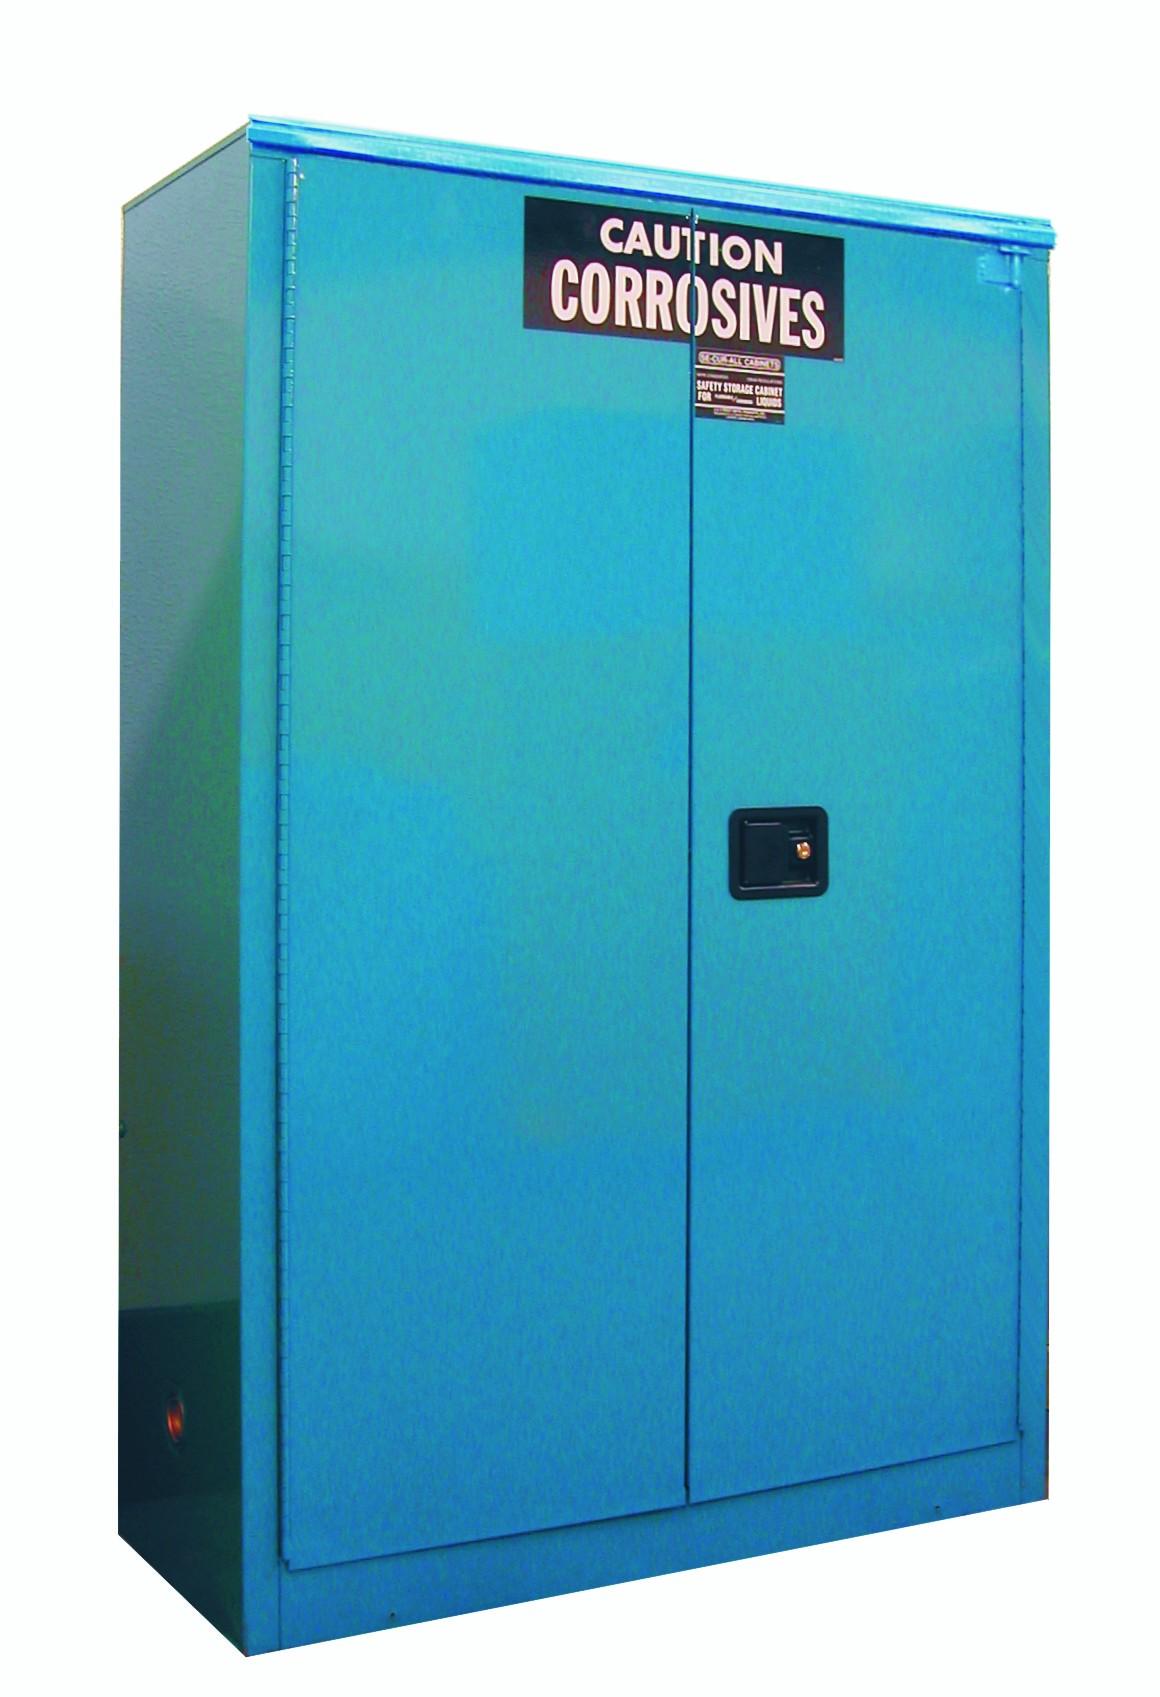 C245 - Acid/Corrosive Storage Cabinet - 45 Gal. Self-Close, Self-Latch Sliding Door